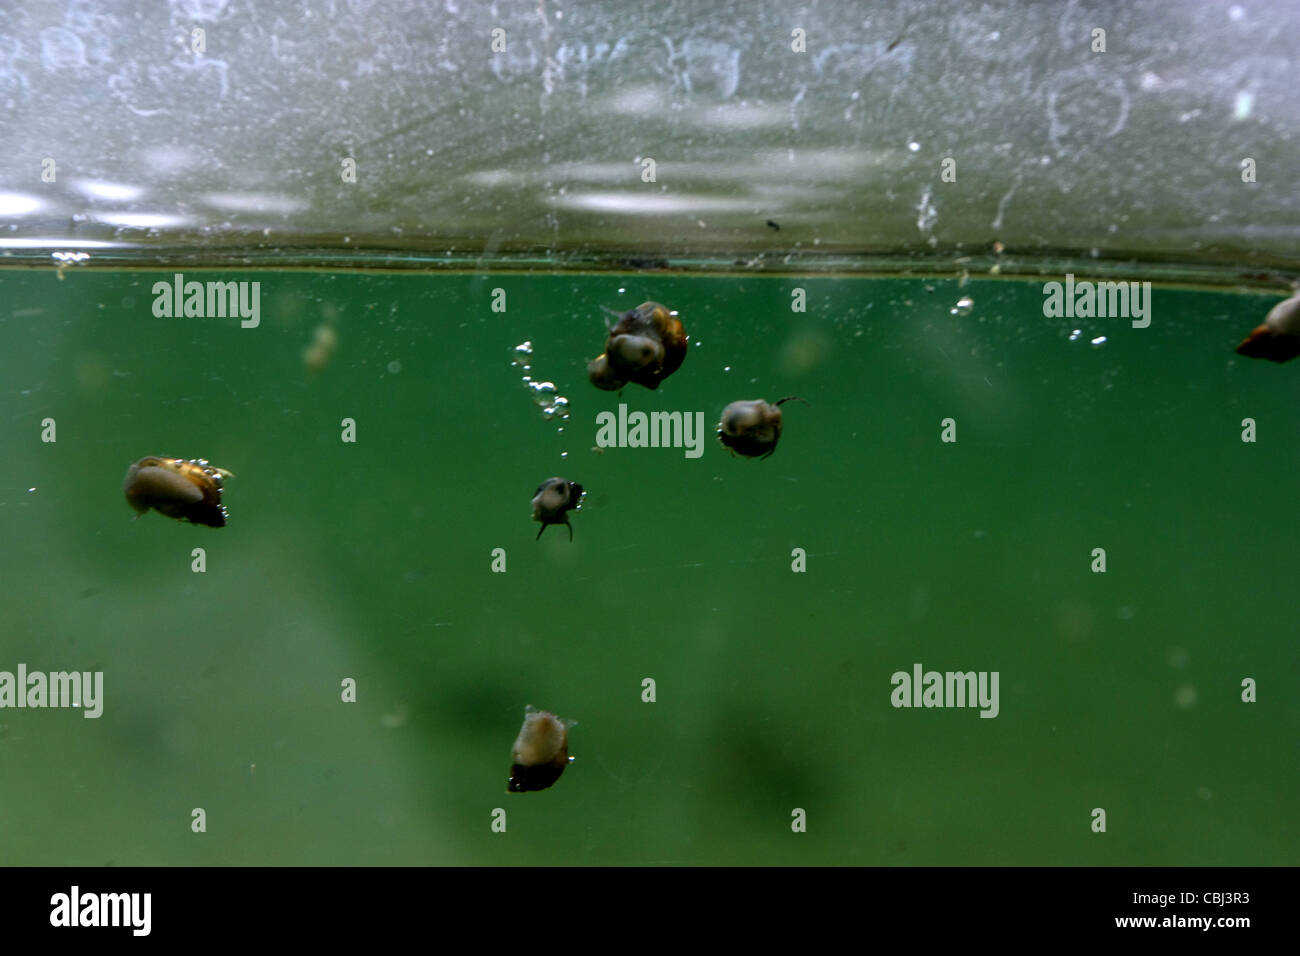 Microbial pool - Stock Image